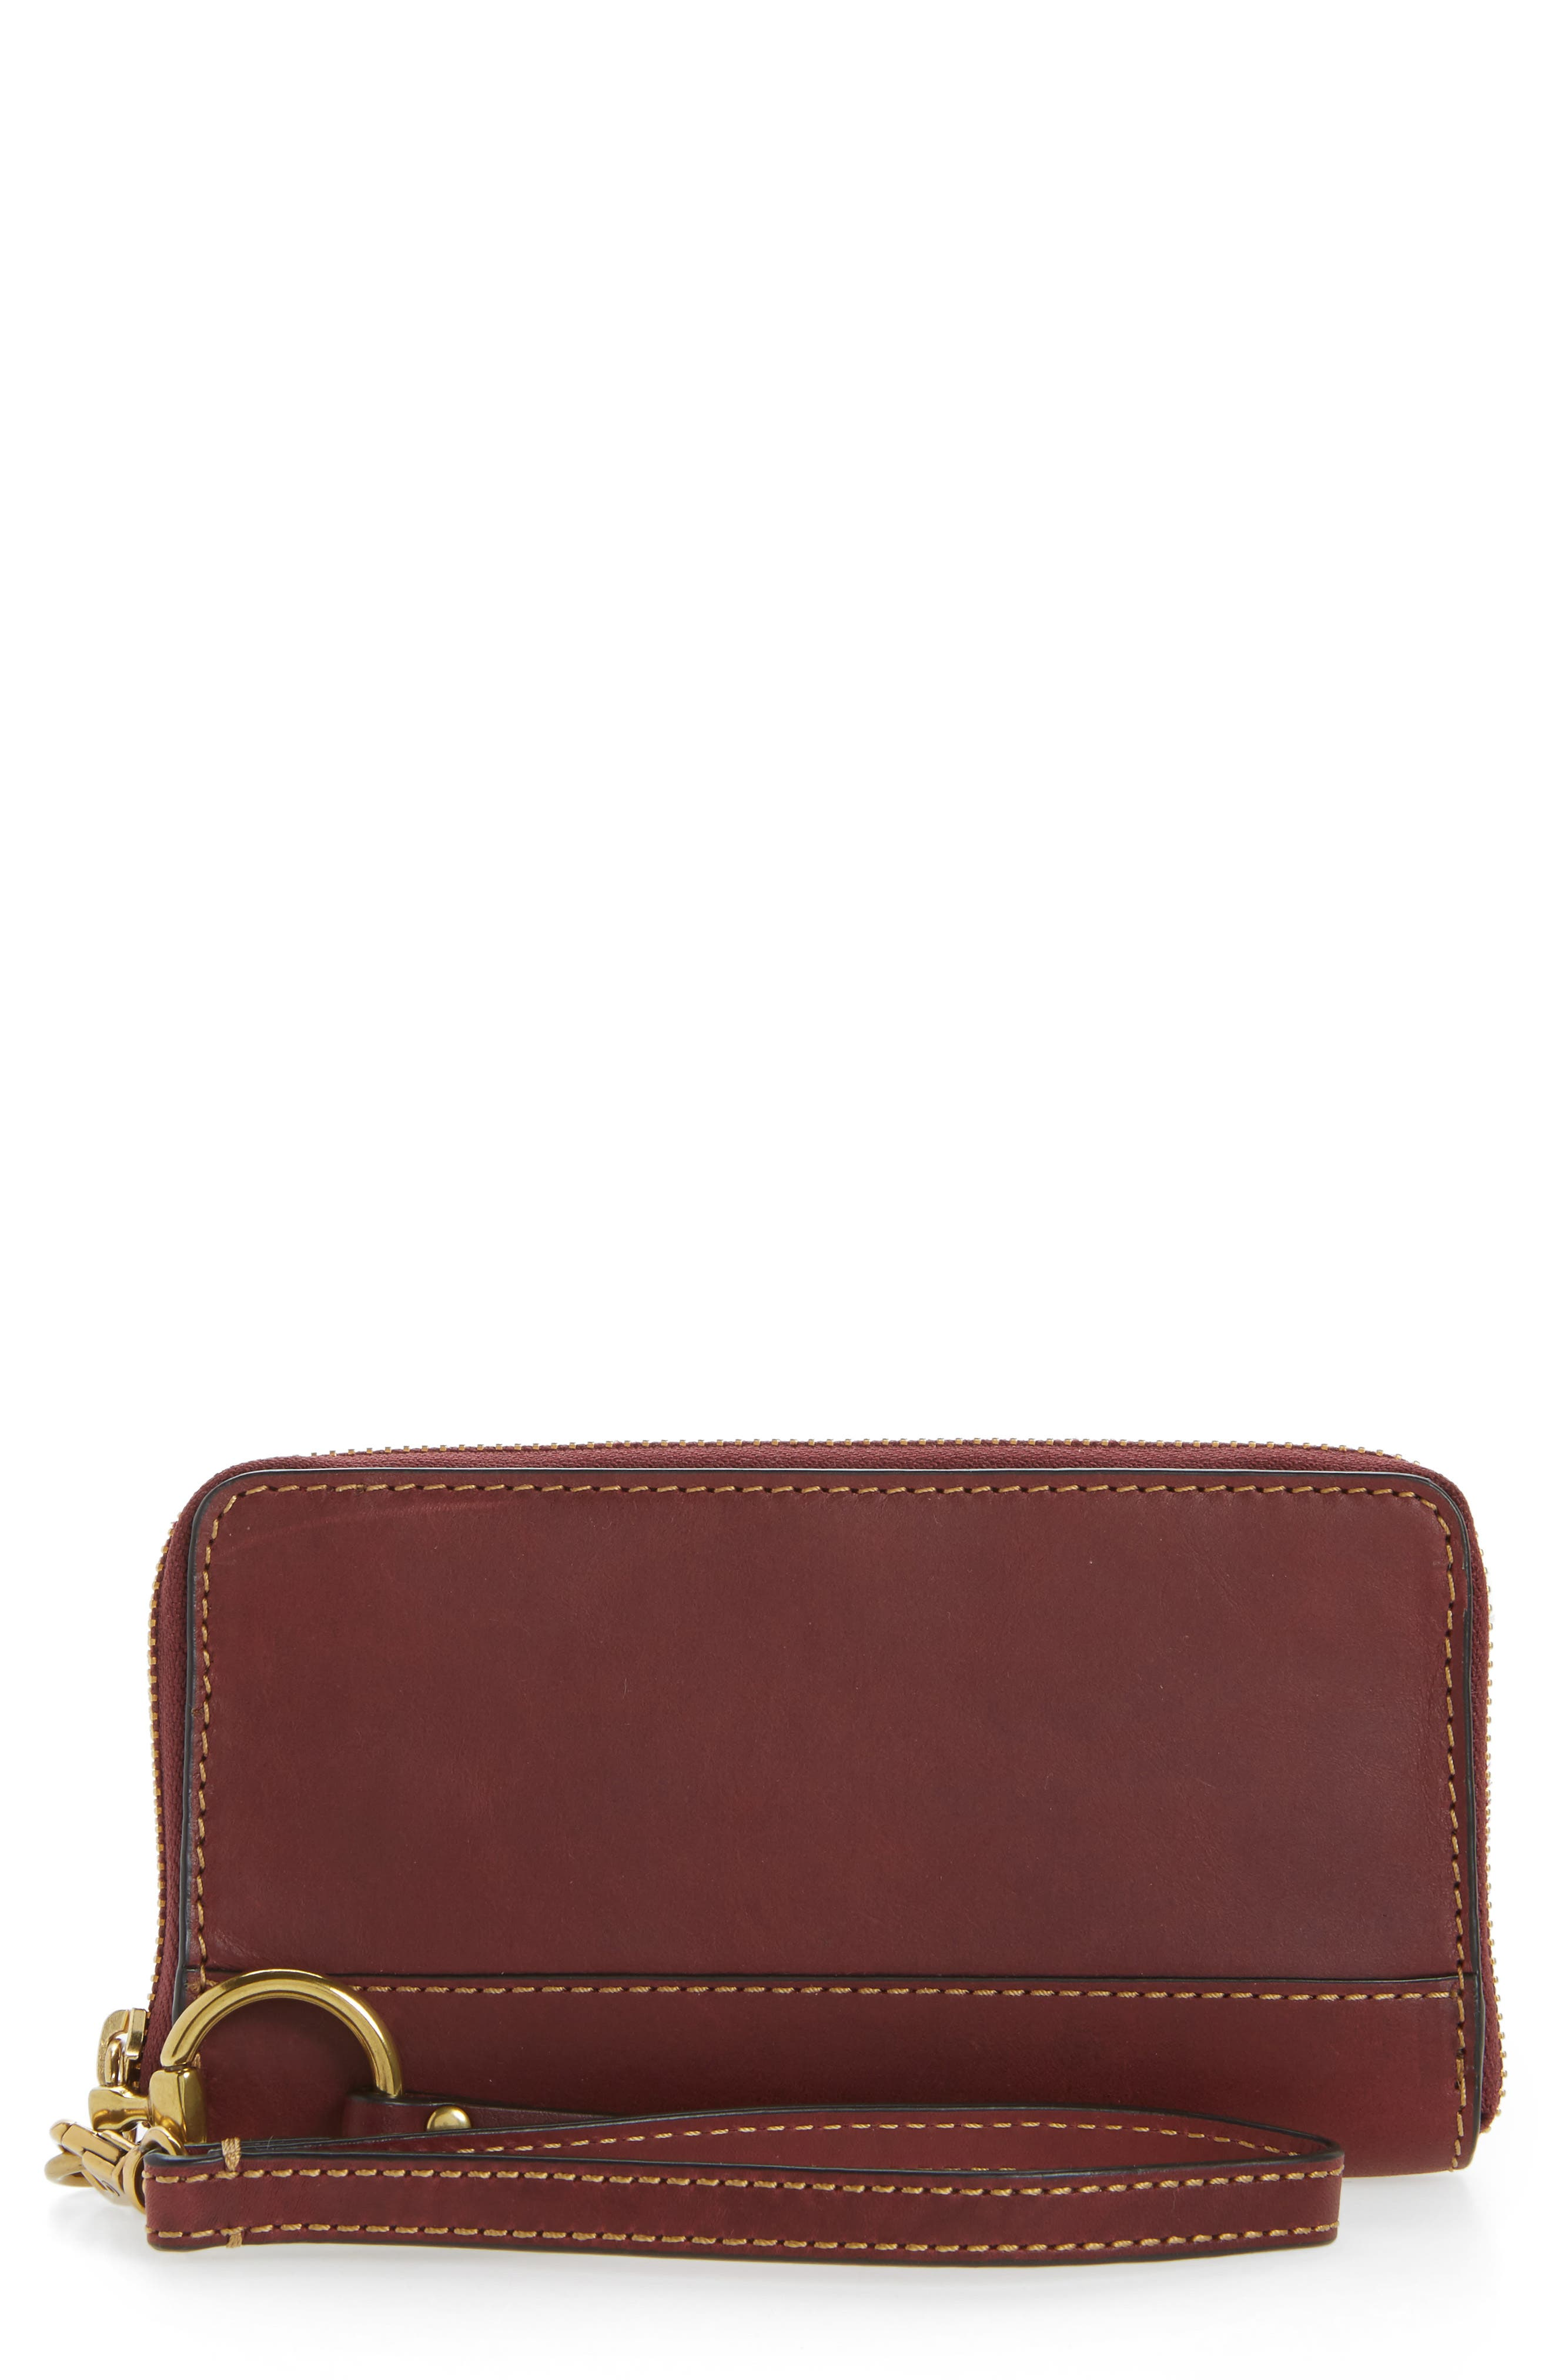 Ilana Harness Phone Leather Zip Wallet,                             Main thumbnail 2, color,